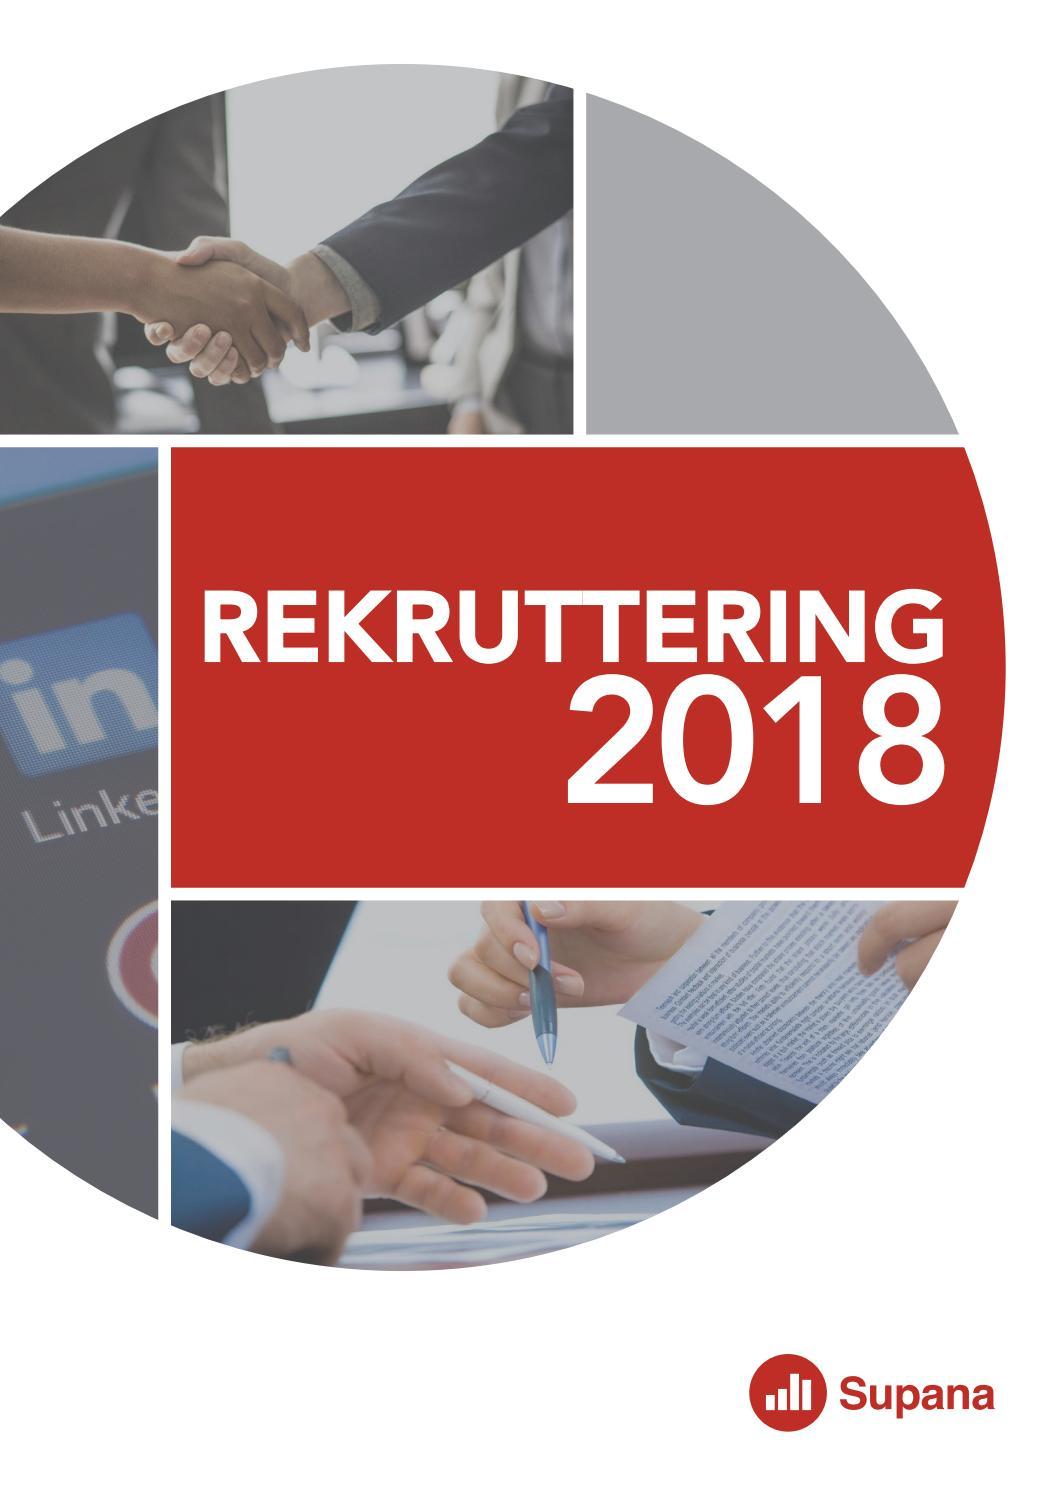 fa5020a1ed13 Brancherapport Rekruttering 2018 by Supana - issuu